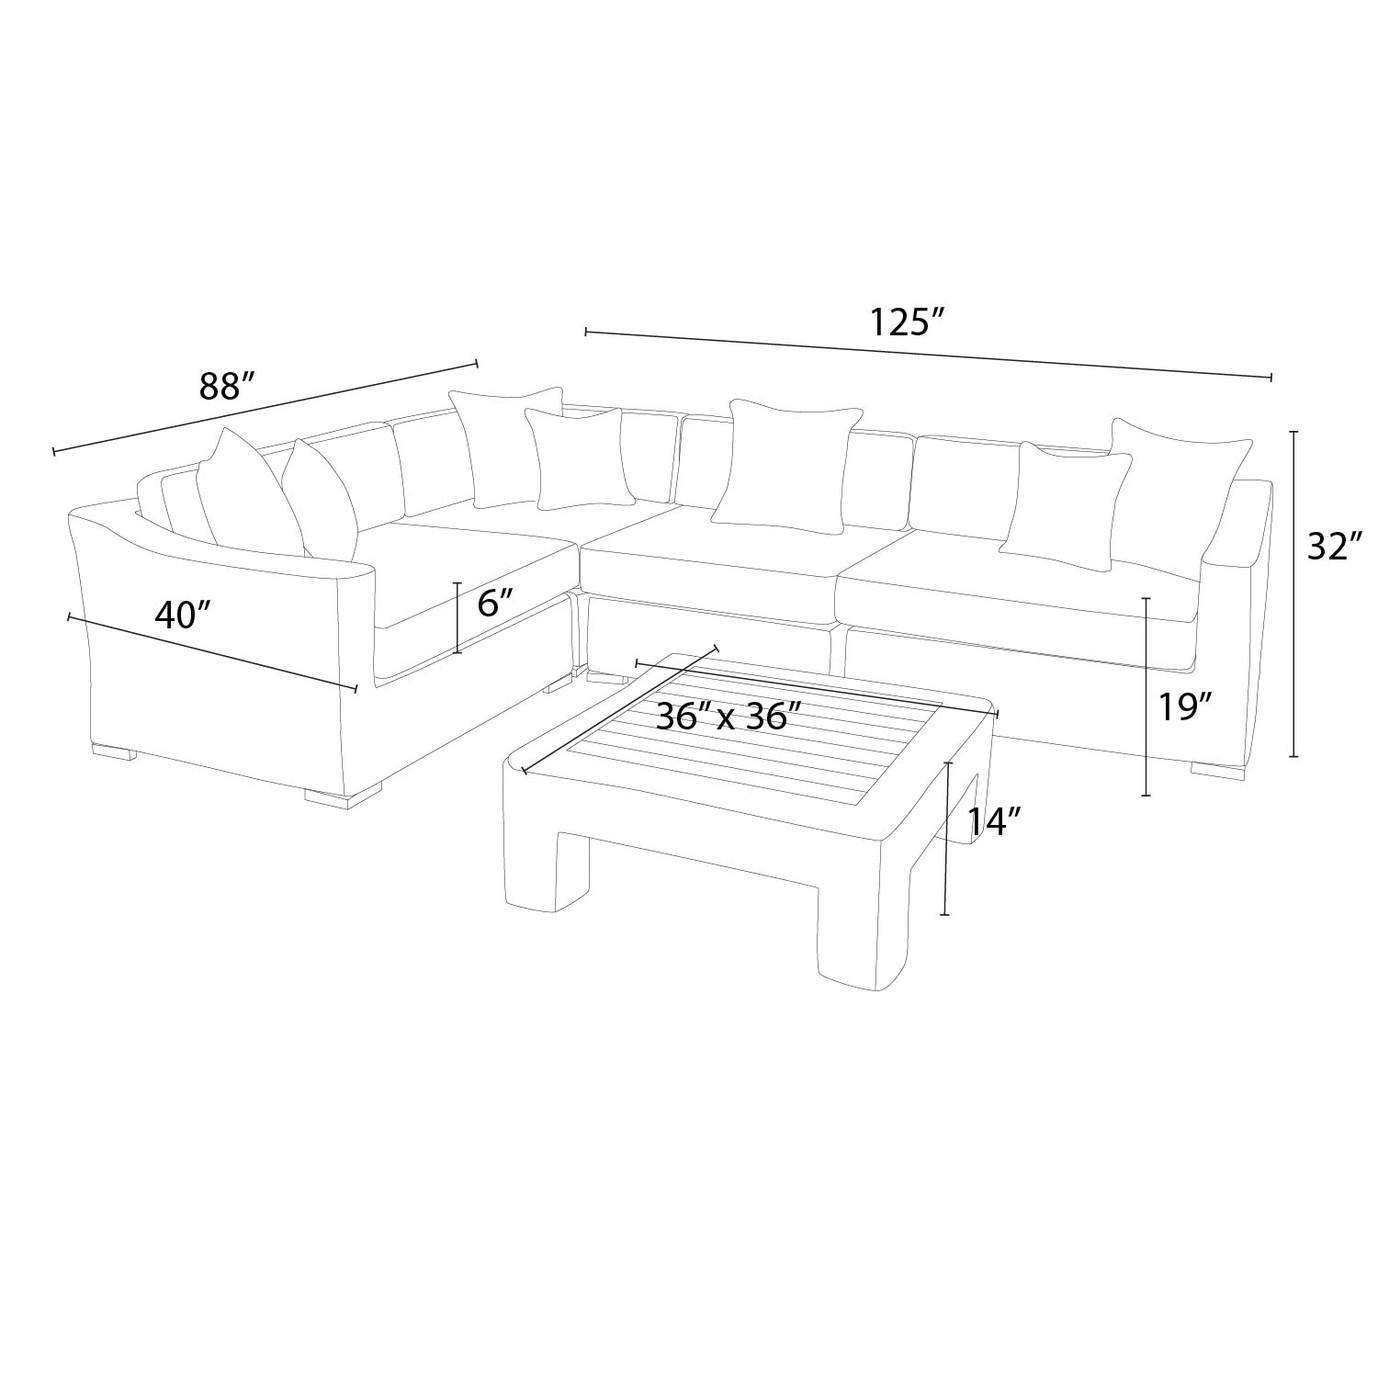 Resort™ 5pc Sectional & Table Set - Espresso/Heather Beige